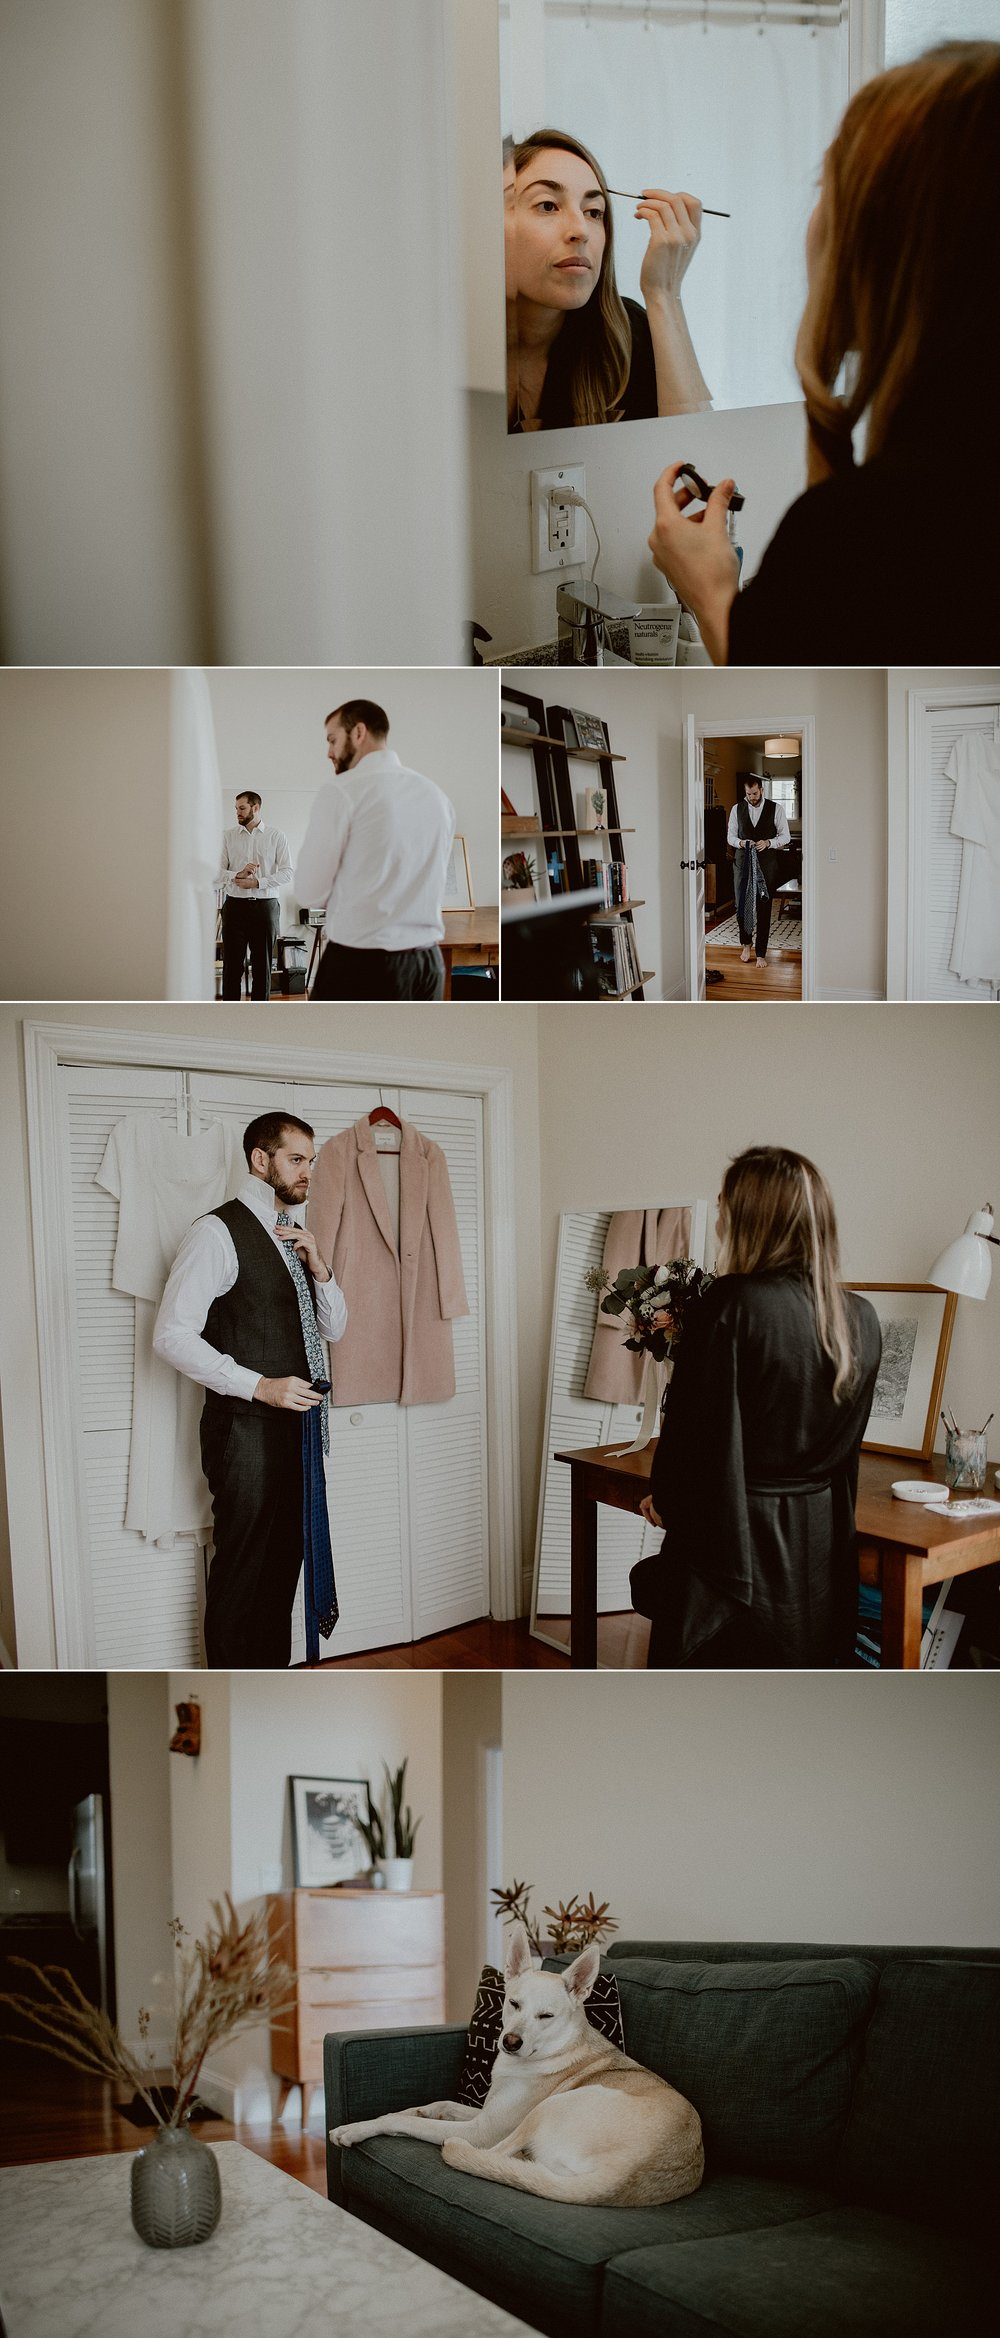 Intimate San Francisco City Hall Wedding | Gretchen Gause Photography #theknotwedding #sfcityhallwedding #sfwedding #sfweddingphotographer #sfelopement #intimatewedding #cityhallwedding